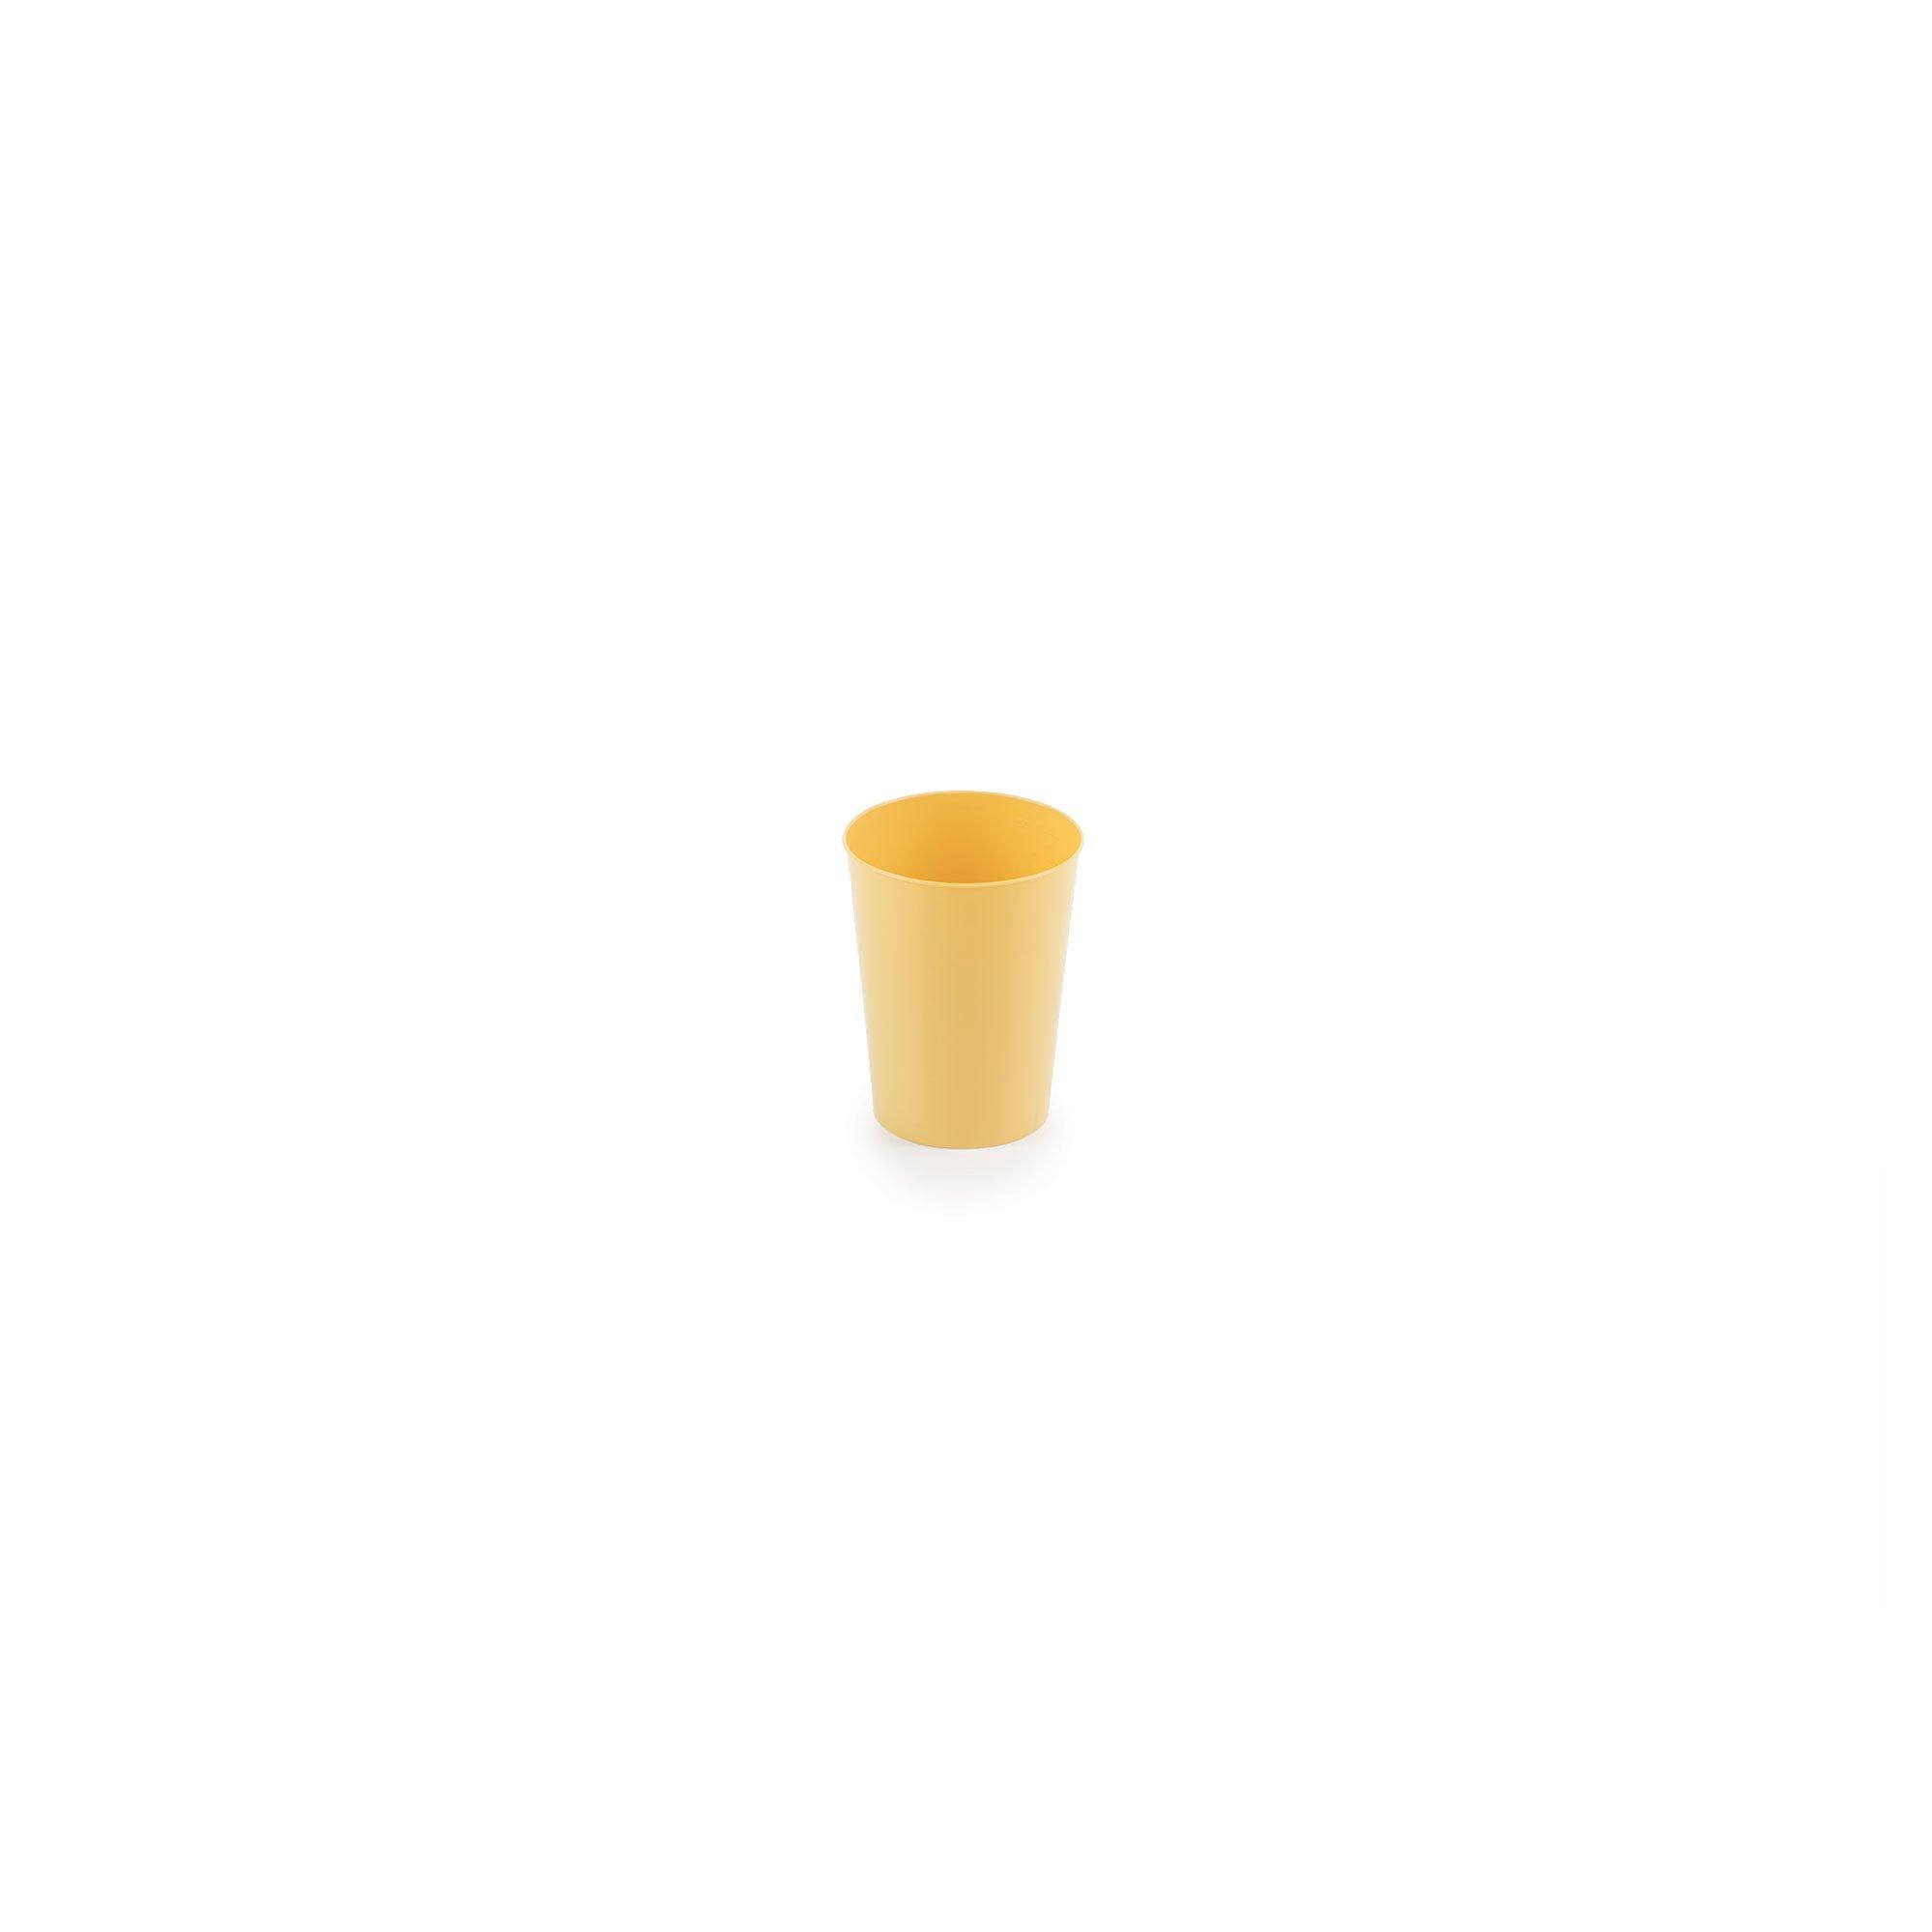 Medegen Medical Products H250-05 Tumbler, 9 oz. Capacity, Gold (Pack of 500)